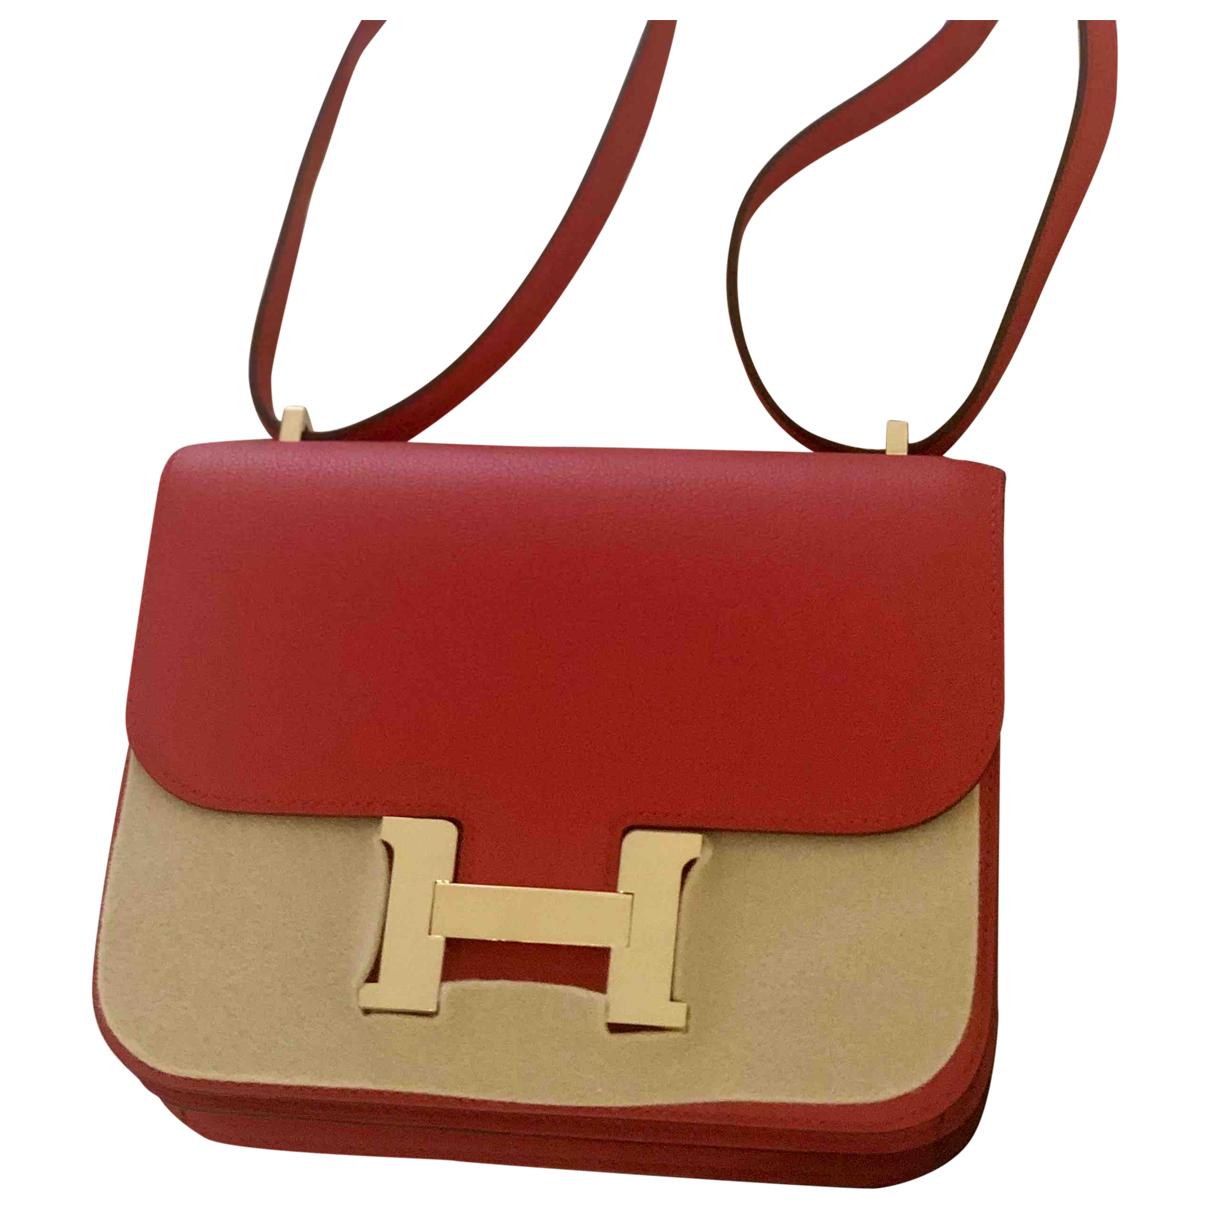 Hermes Constance Handtasche in  Rot Leder